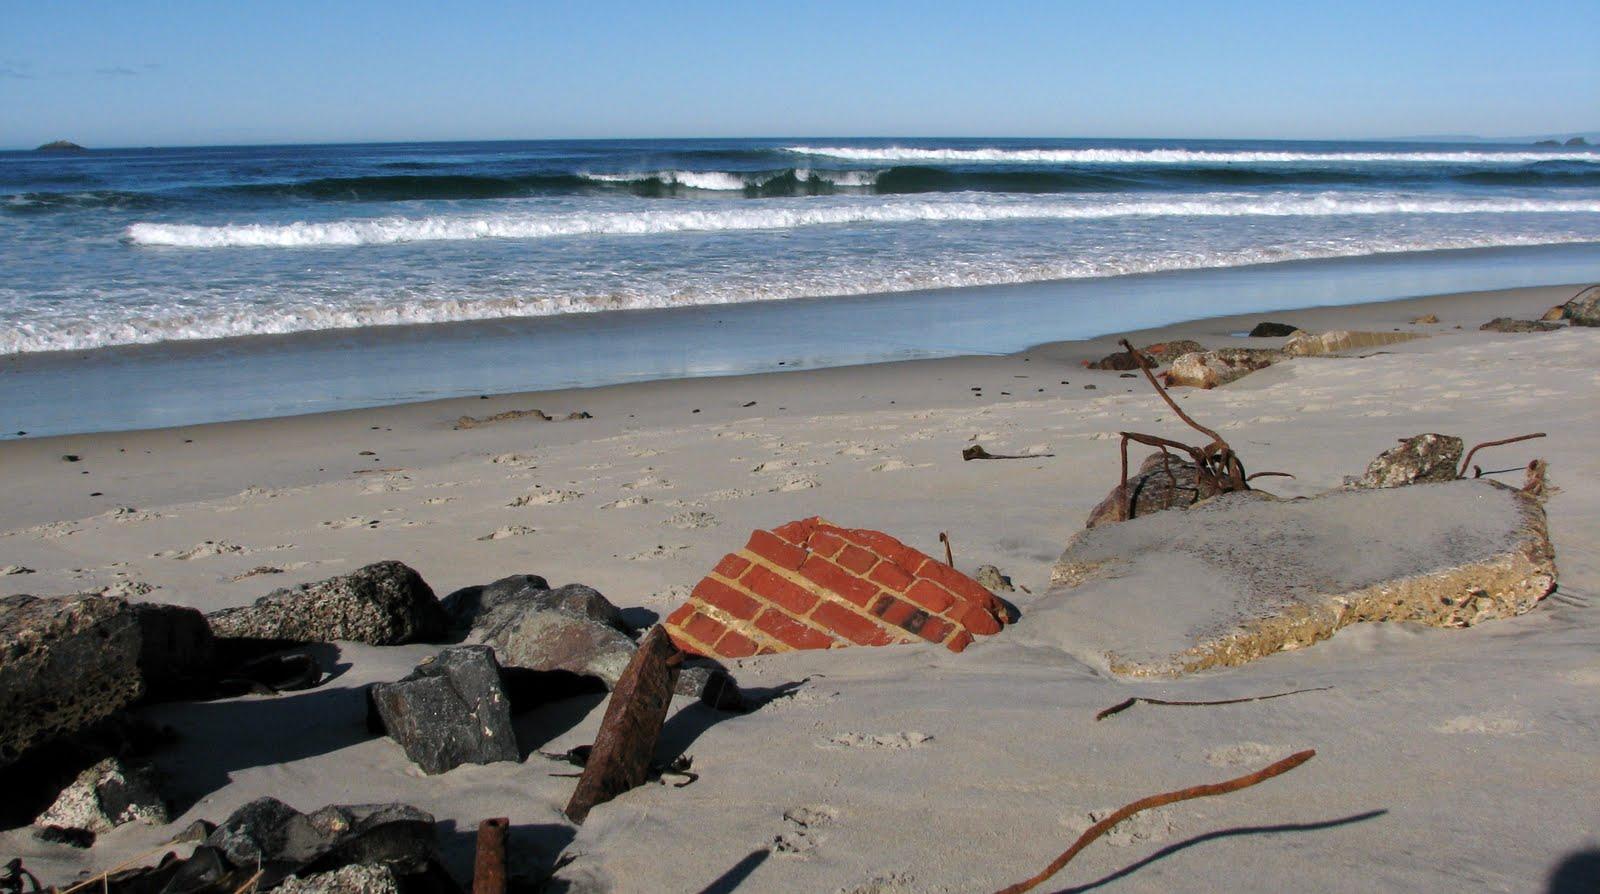 brick wall remains on beach